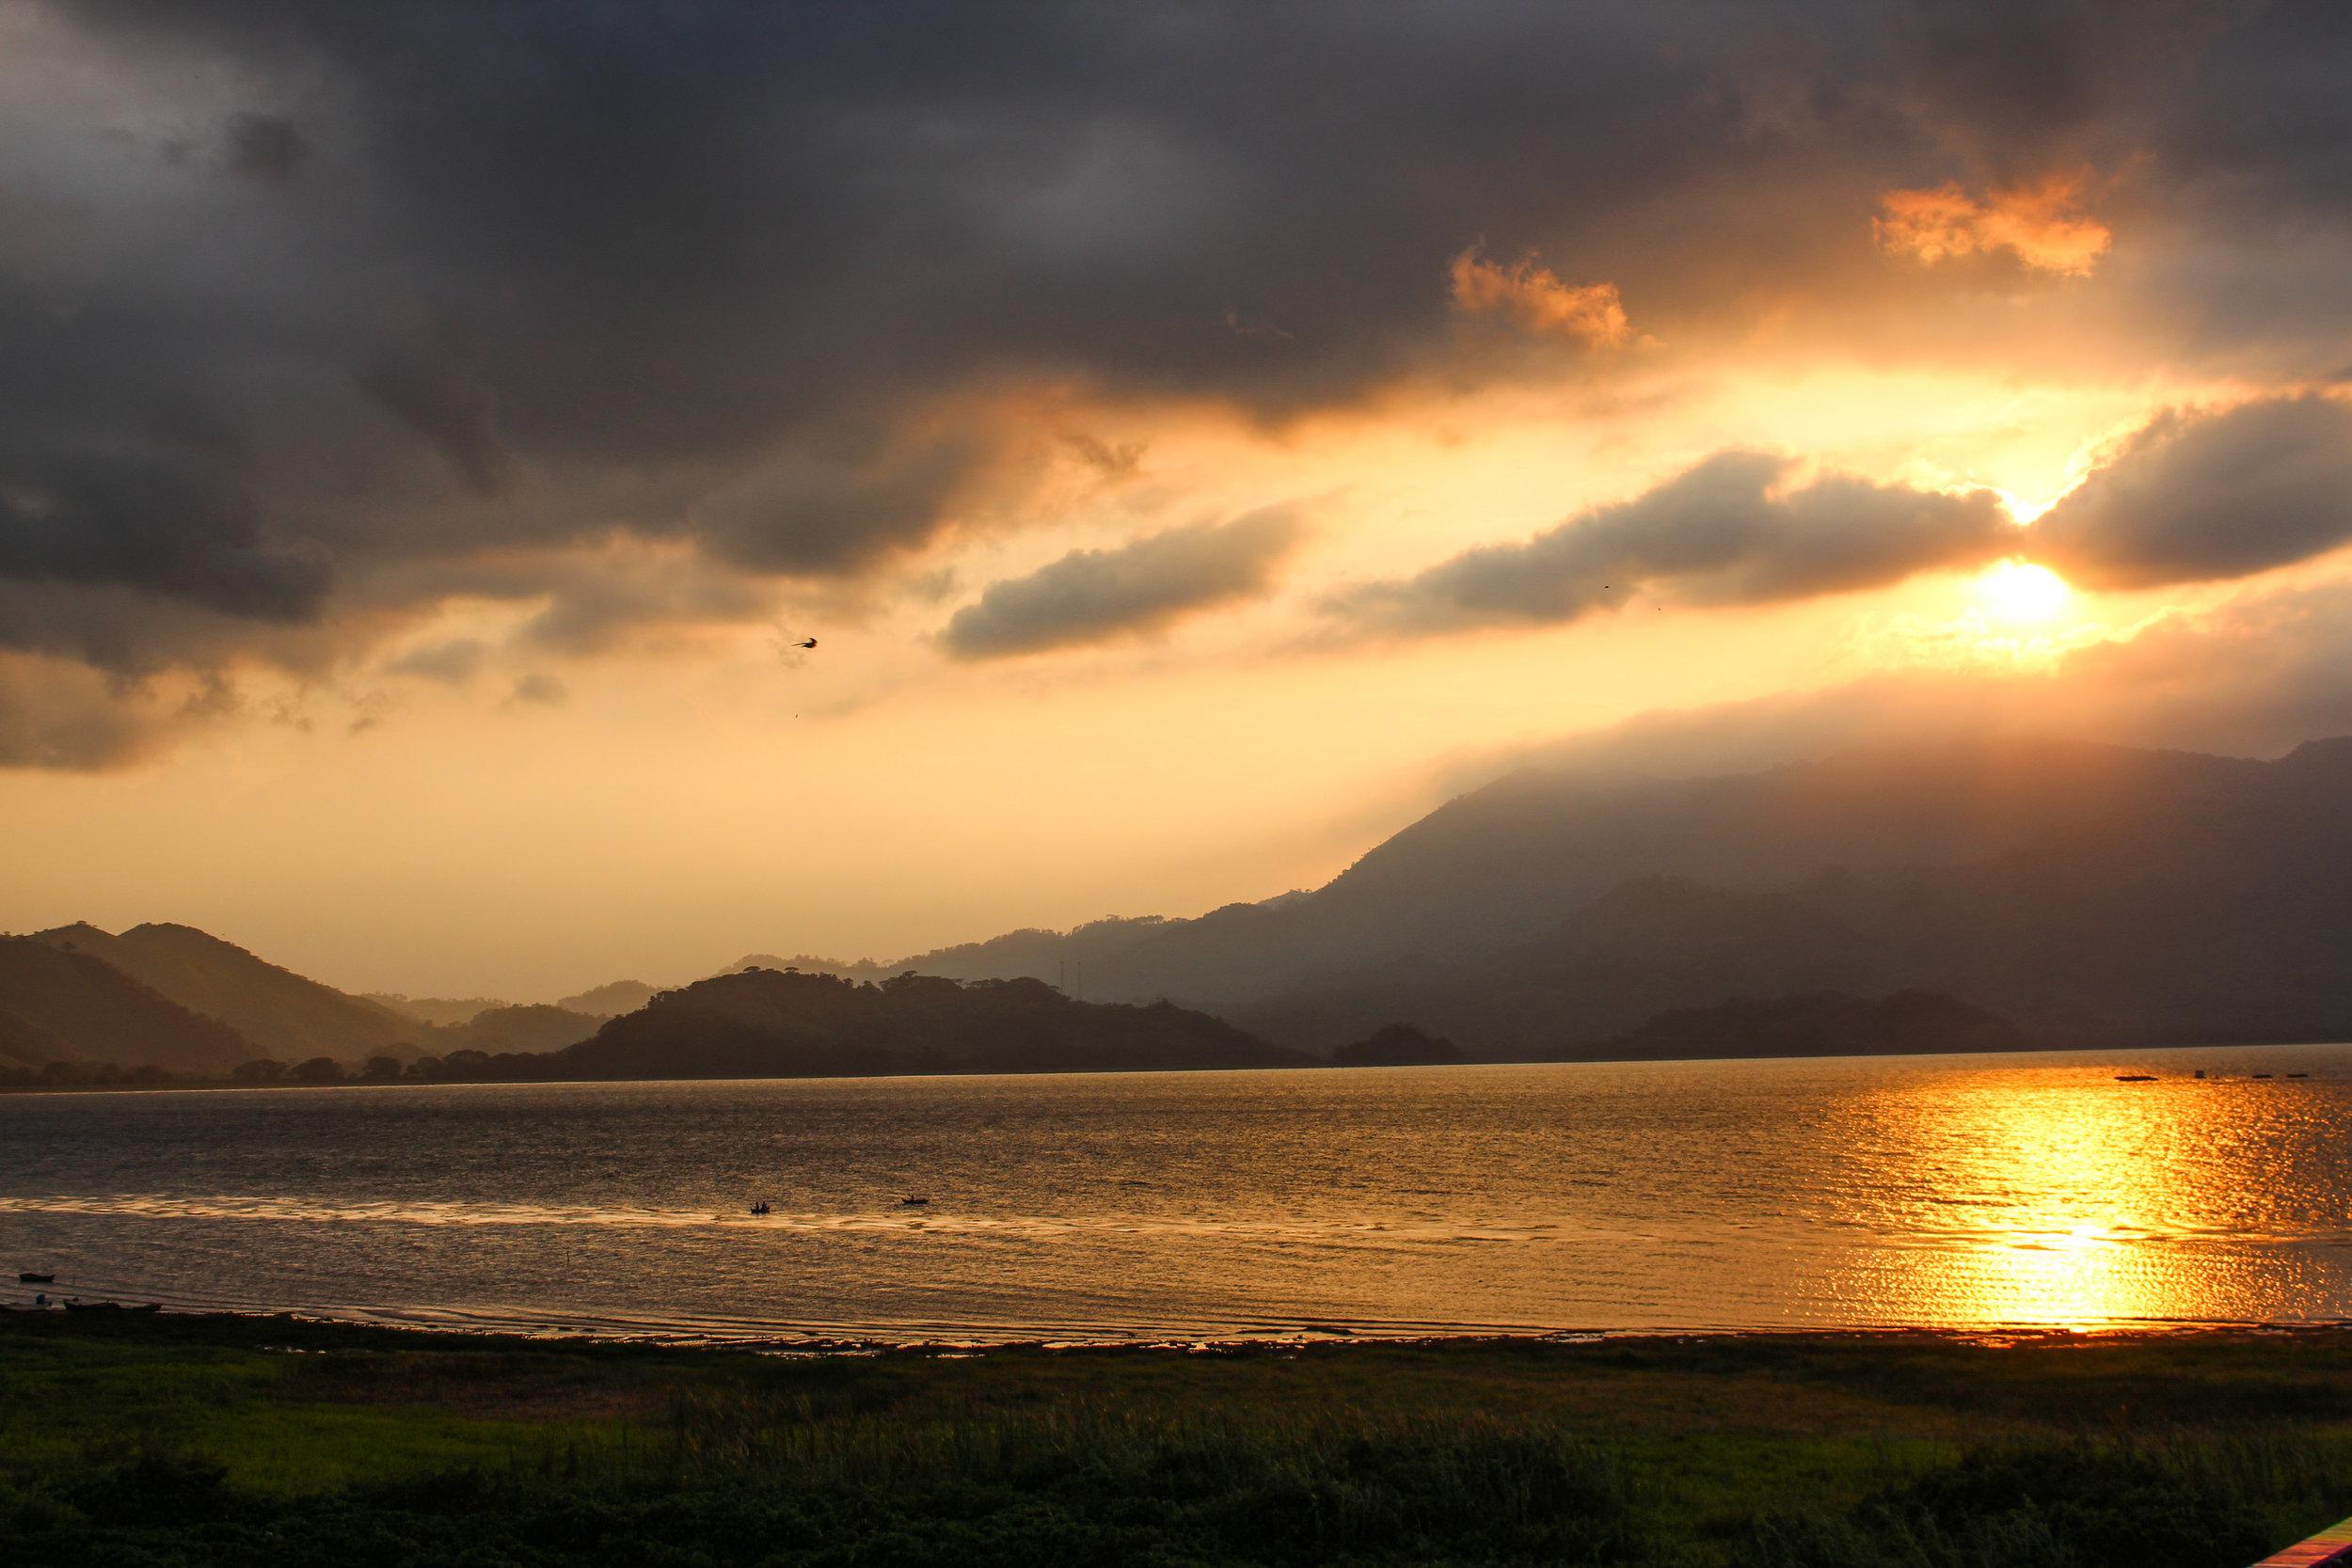 Lake Yojoa looking majestic at sunset. The surrounding area is under threat.